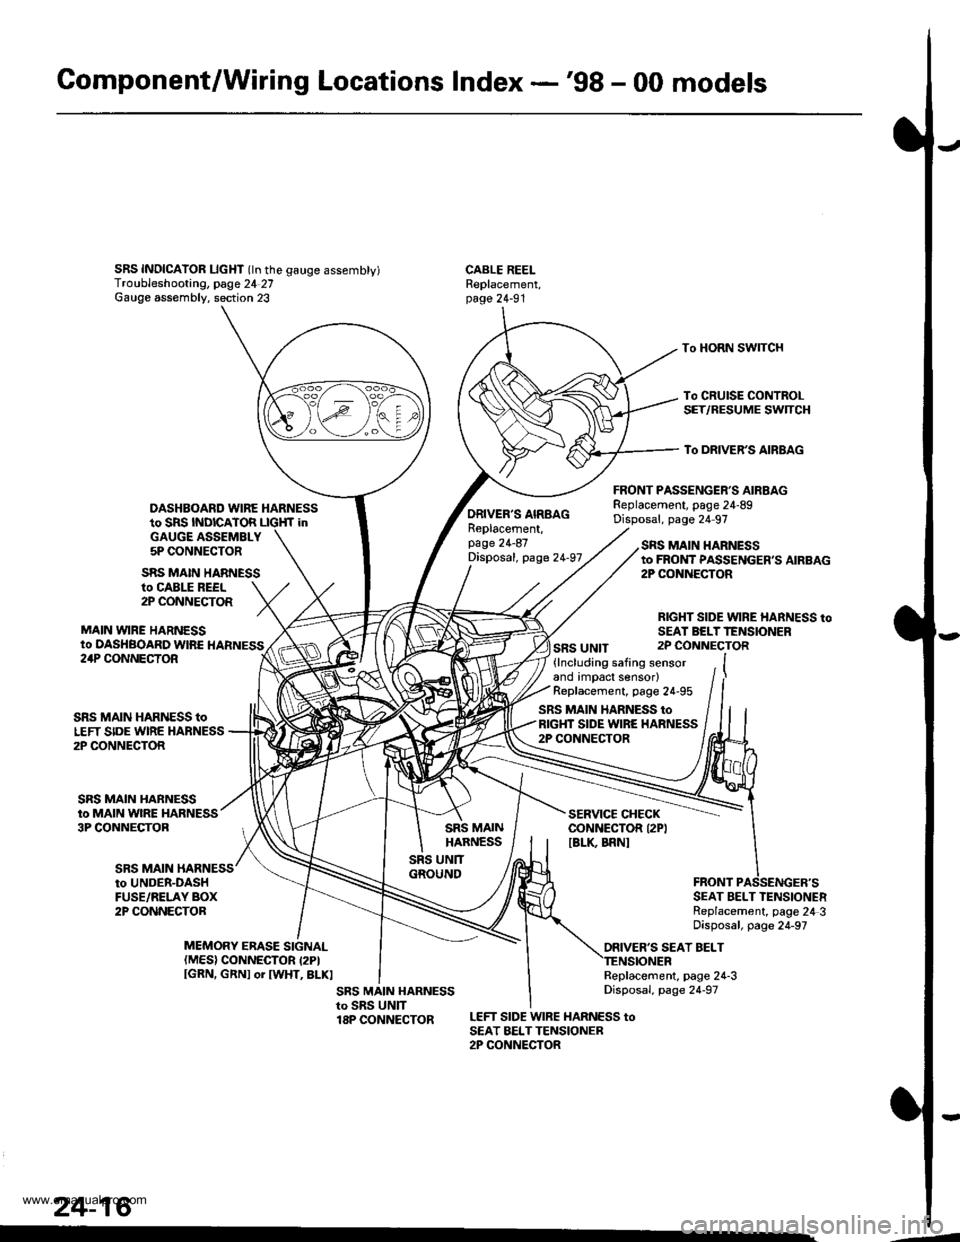 Luxury 09 acadia airbag wiring diagram images wiring diagram ideas